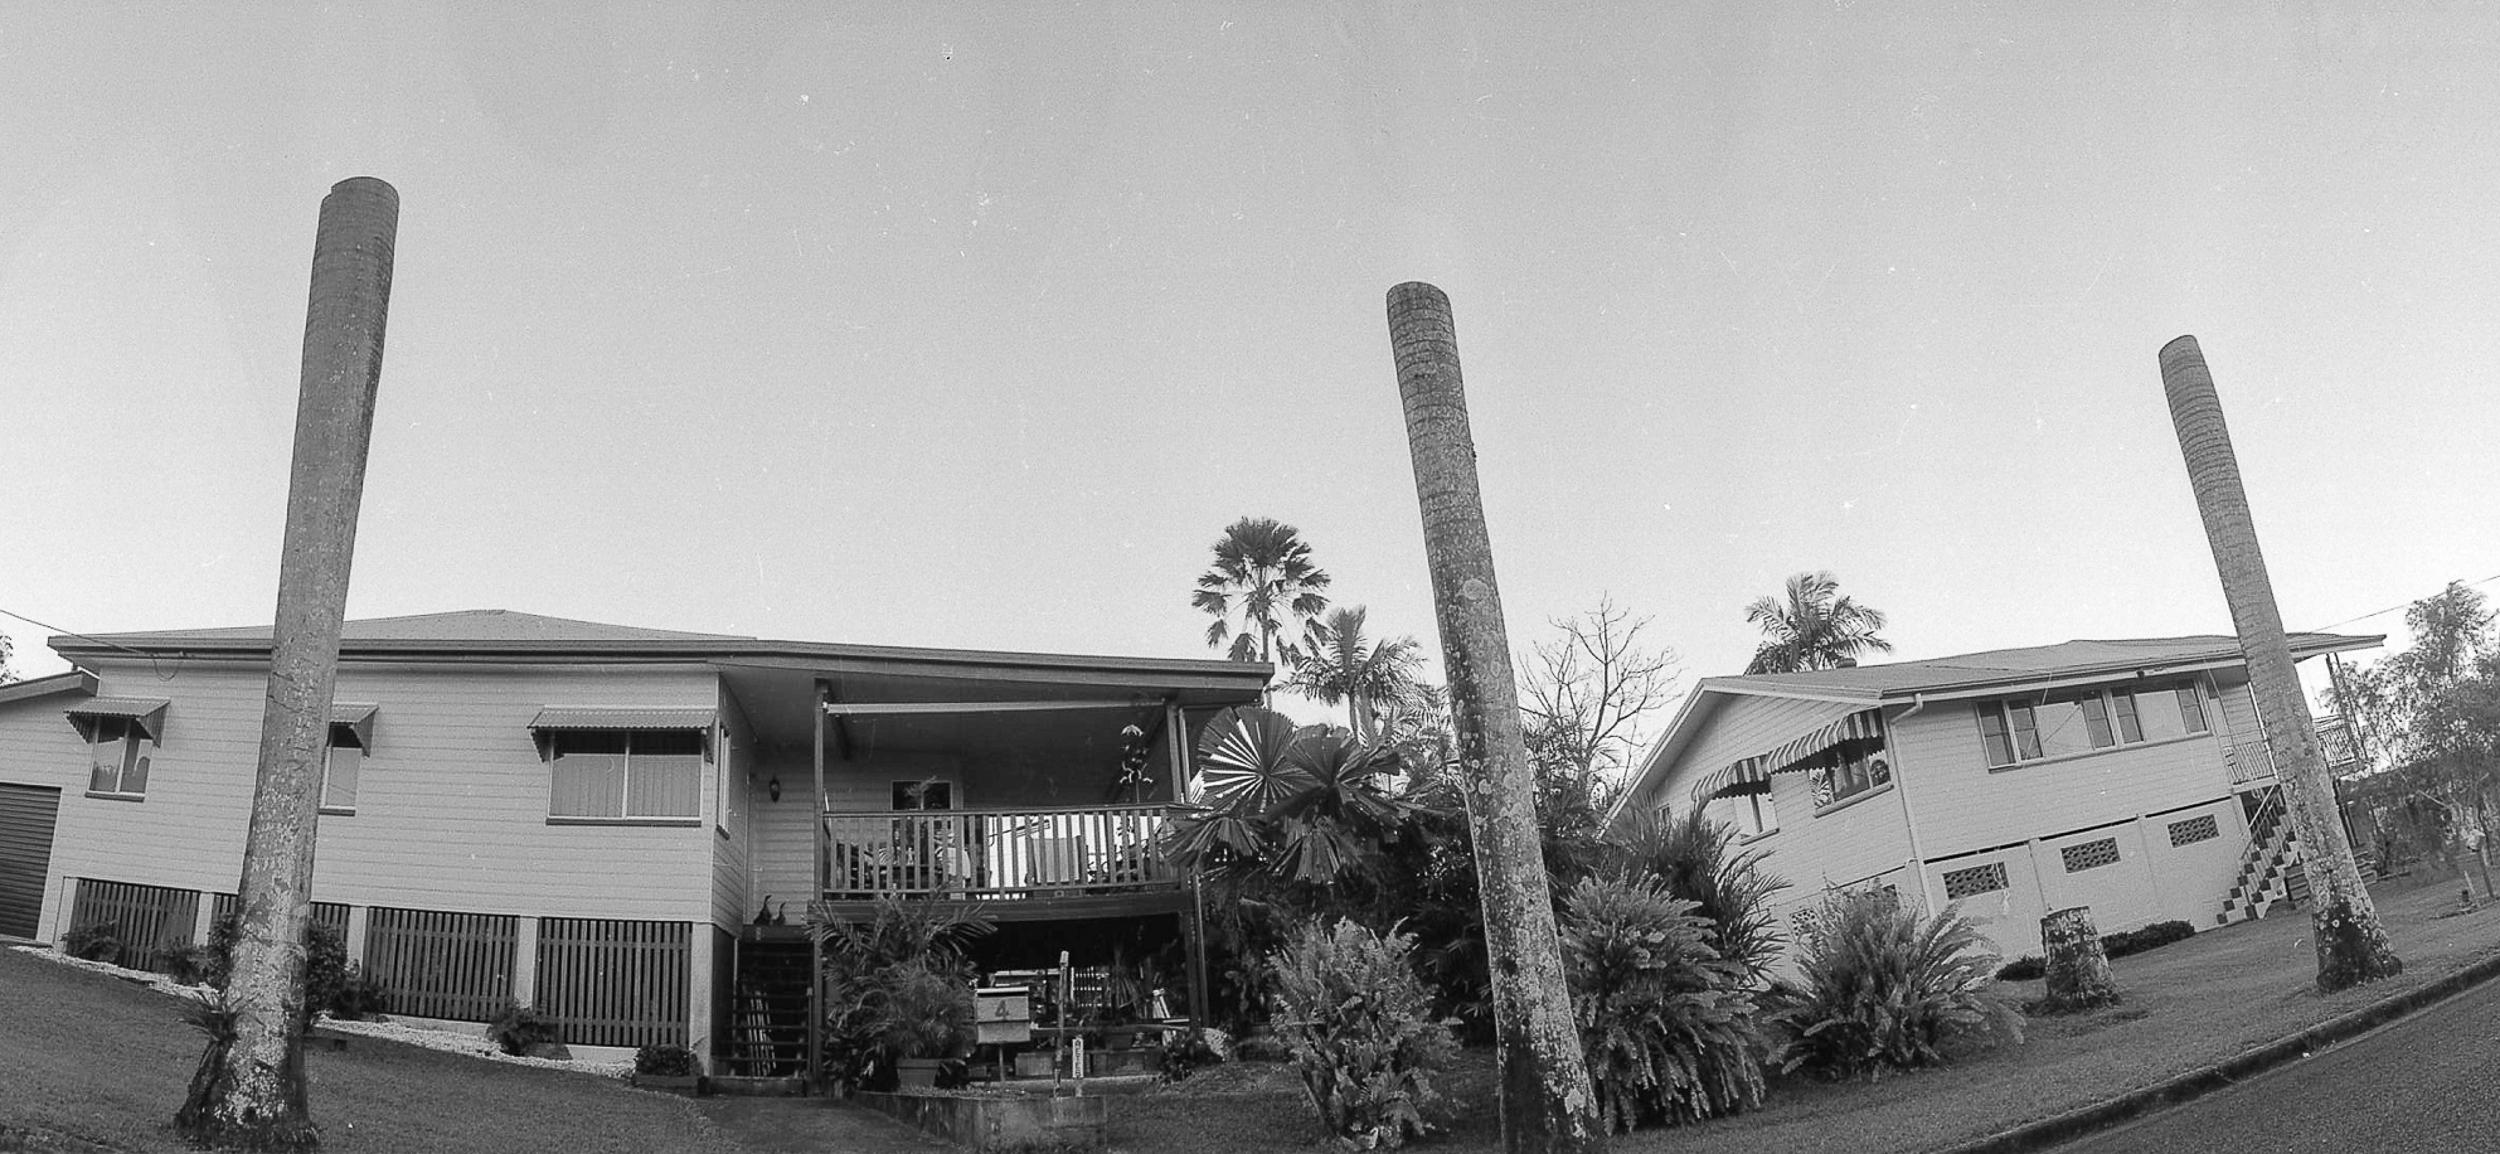 Three dead palm trees